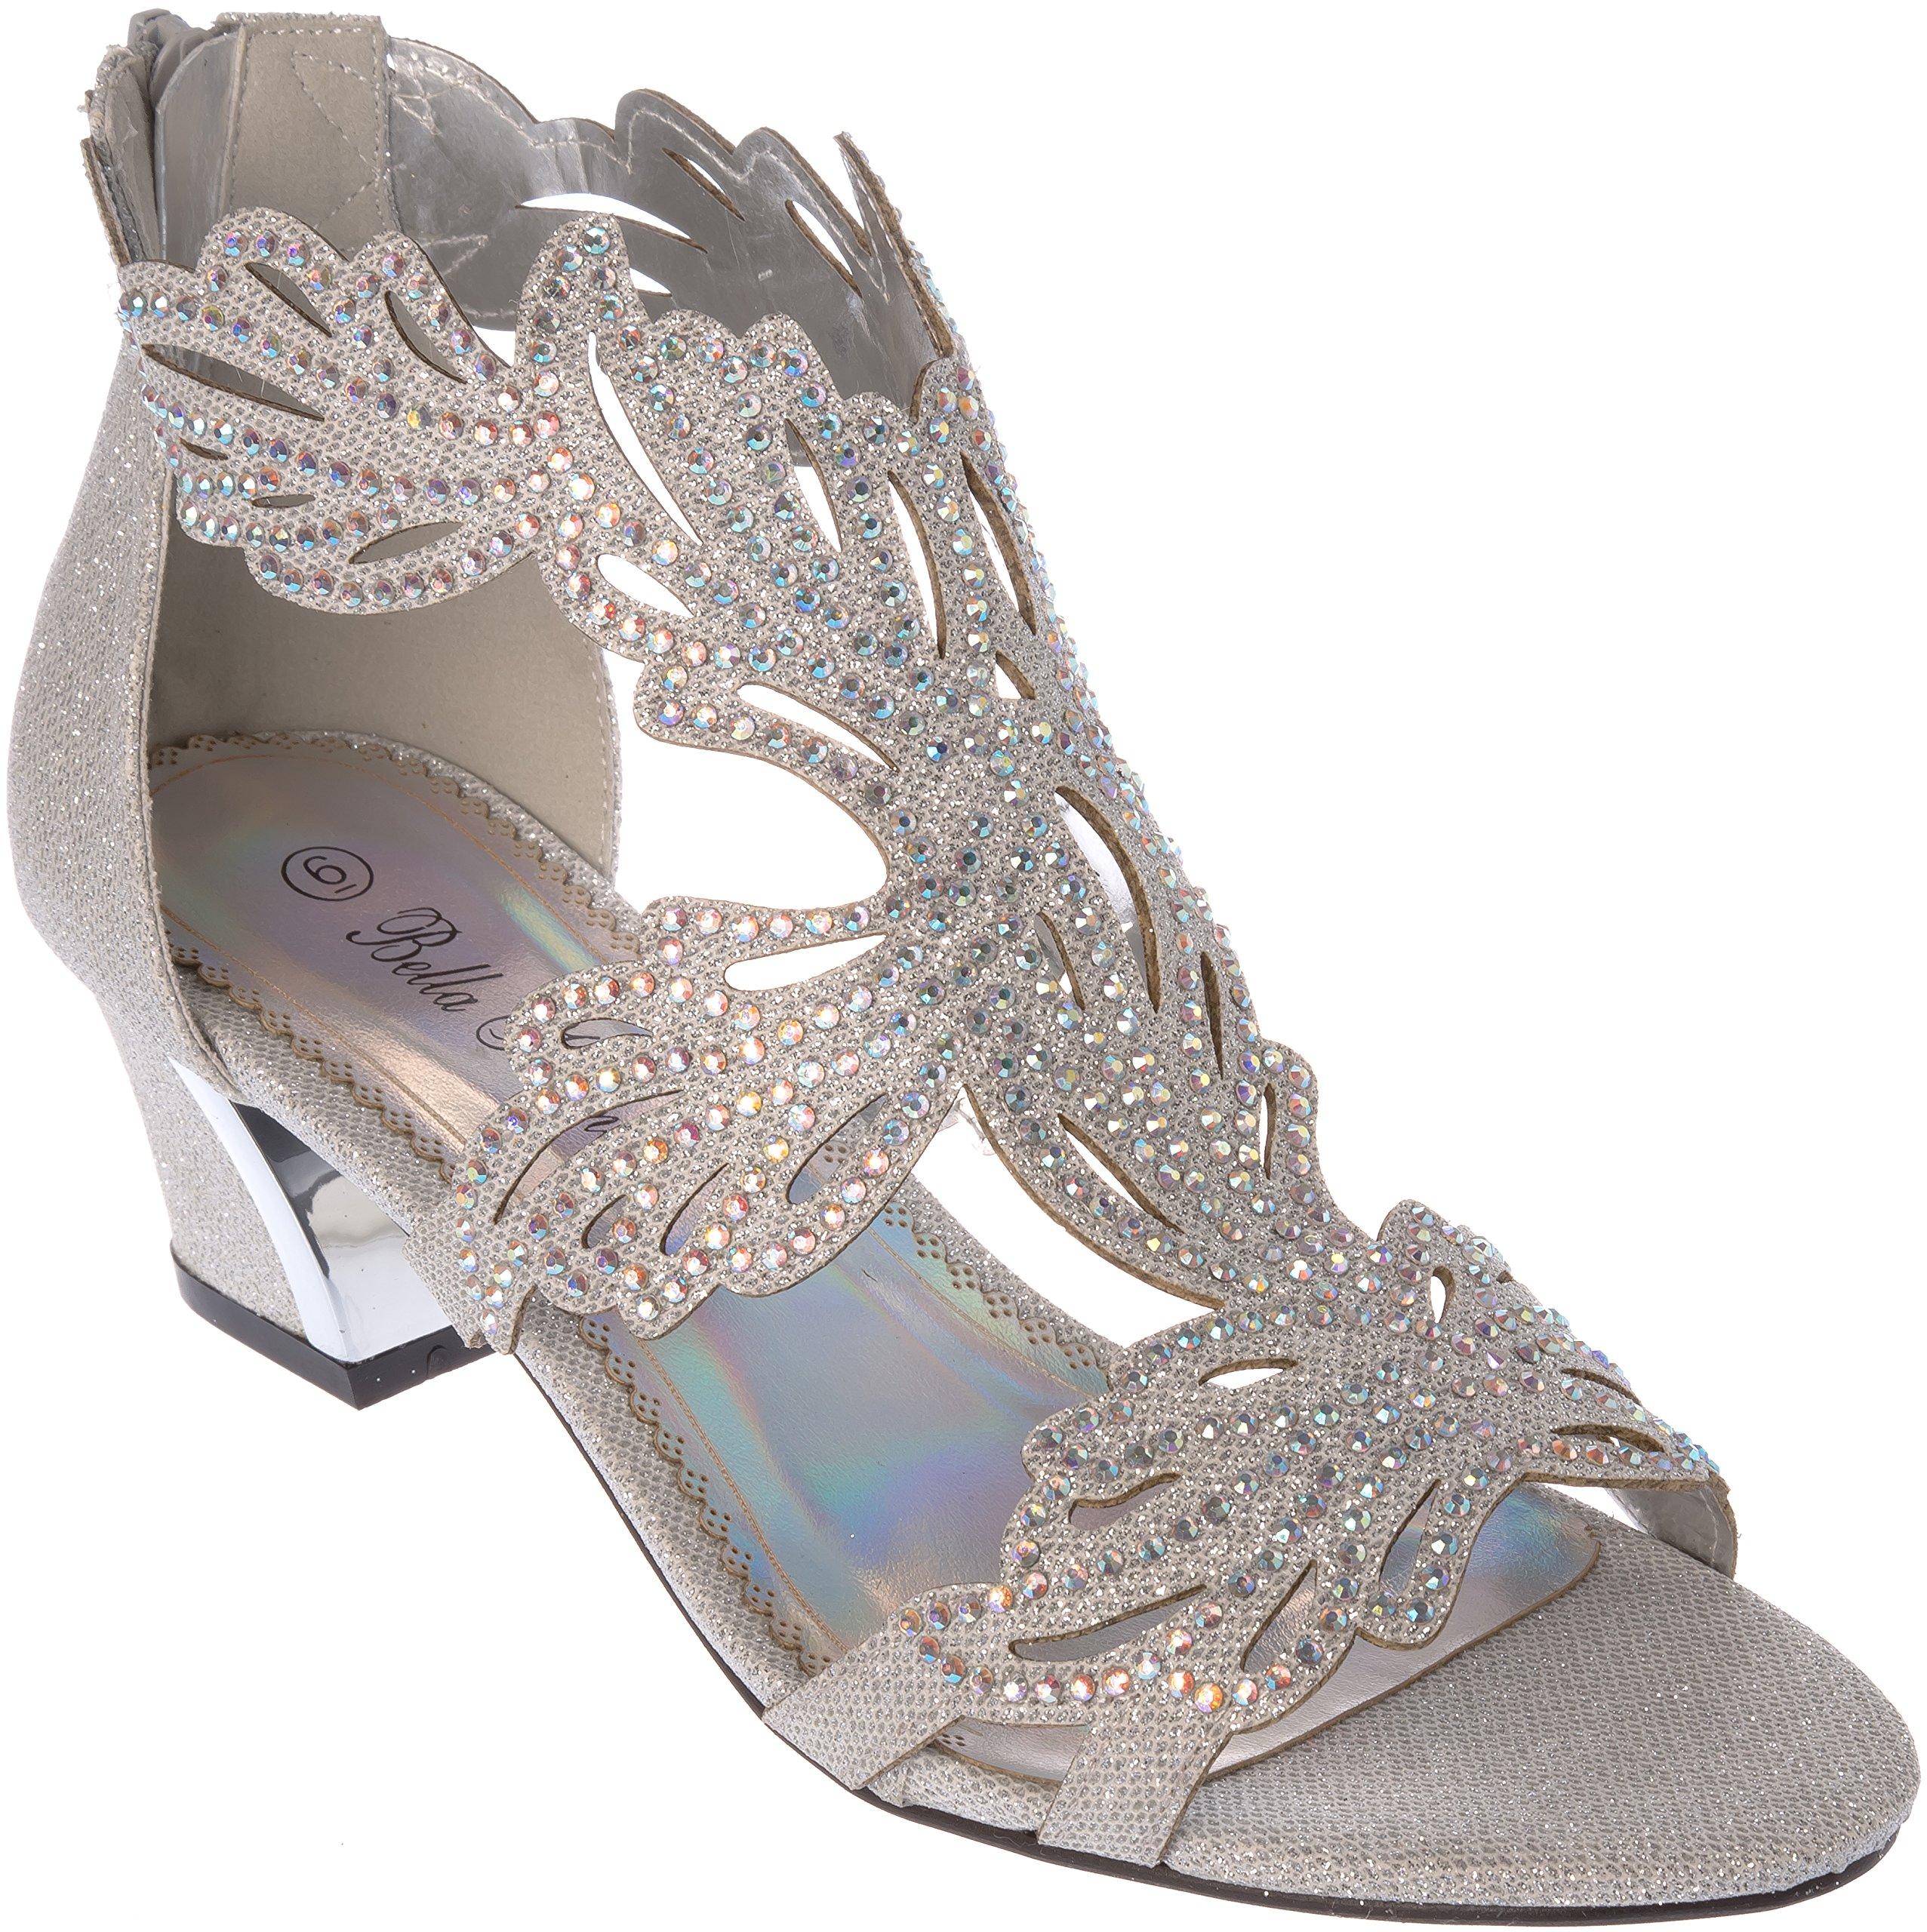 Shoes Picker lime03 Women Evening Sandal Rhinestone Silver Dress-Shoes Size 7.5